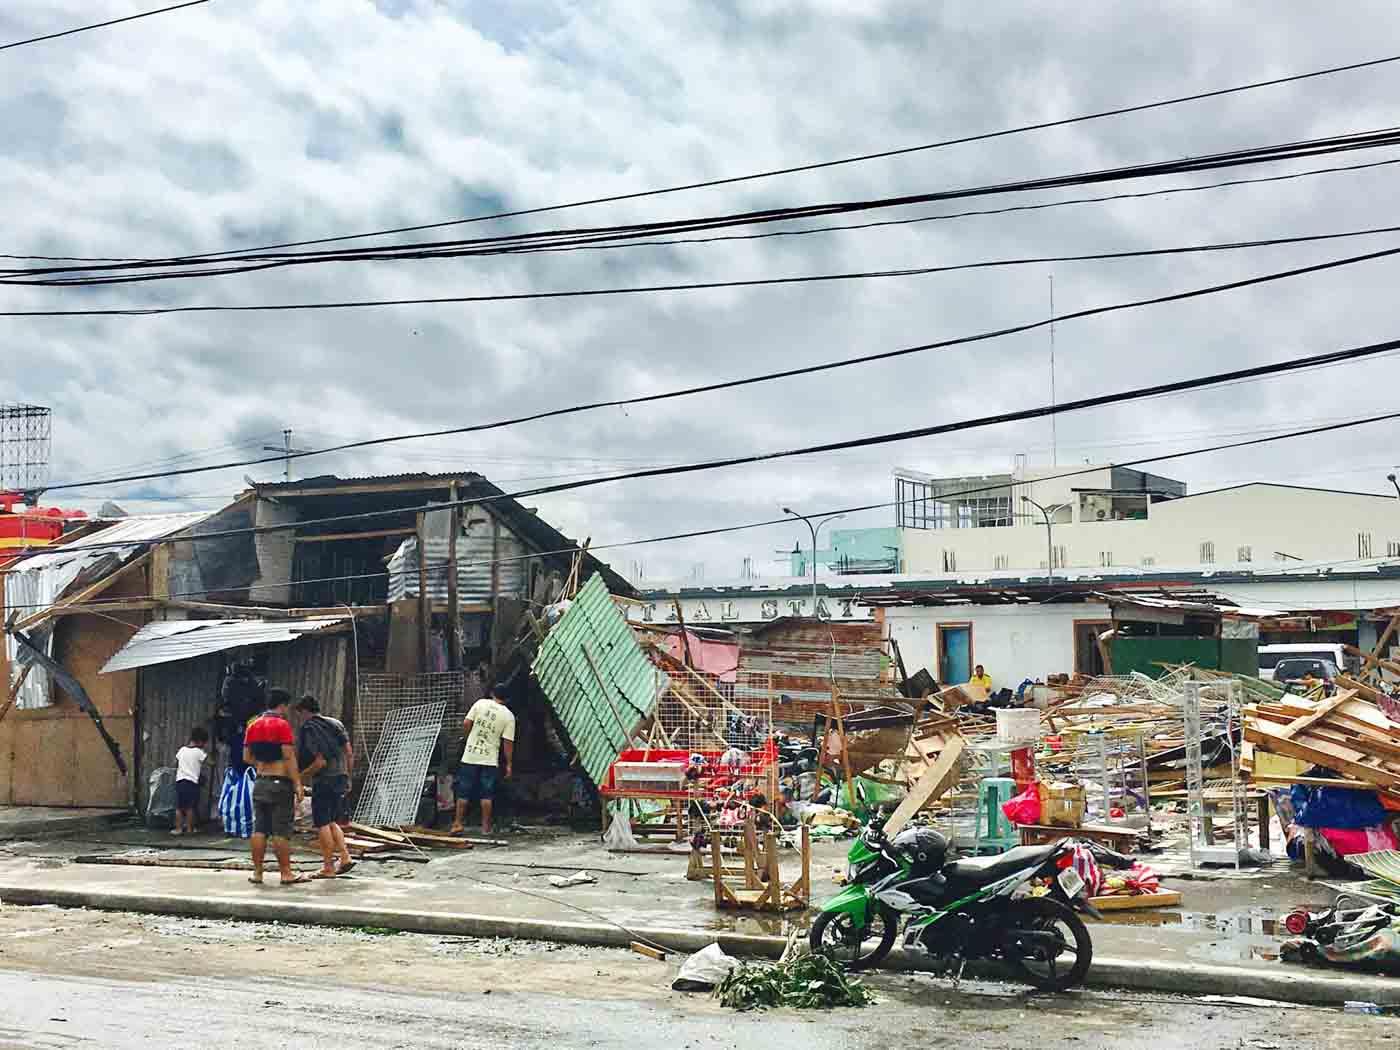 DEVASTATED. Residential areas in Naga City were shattered by Typhoon Nina. Photo by Jerome Ruiz Berja/Rappler